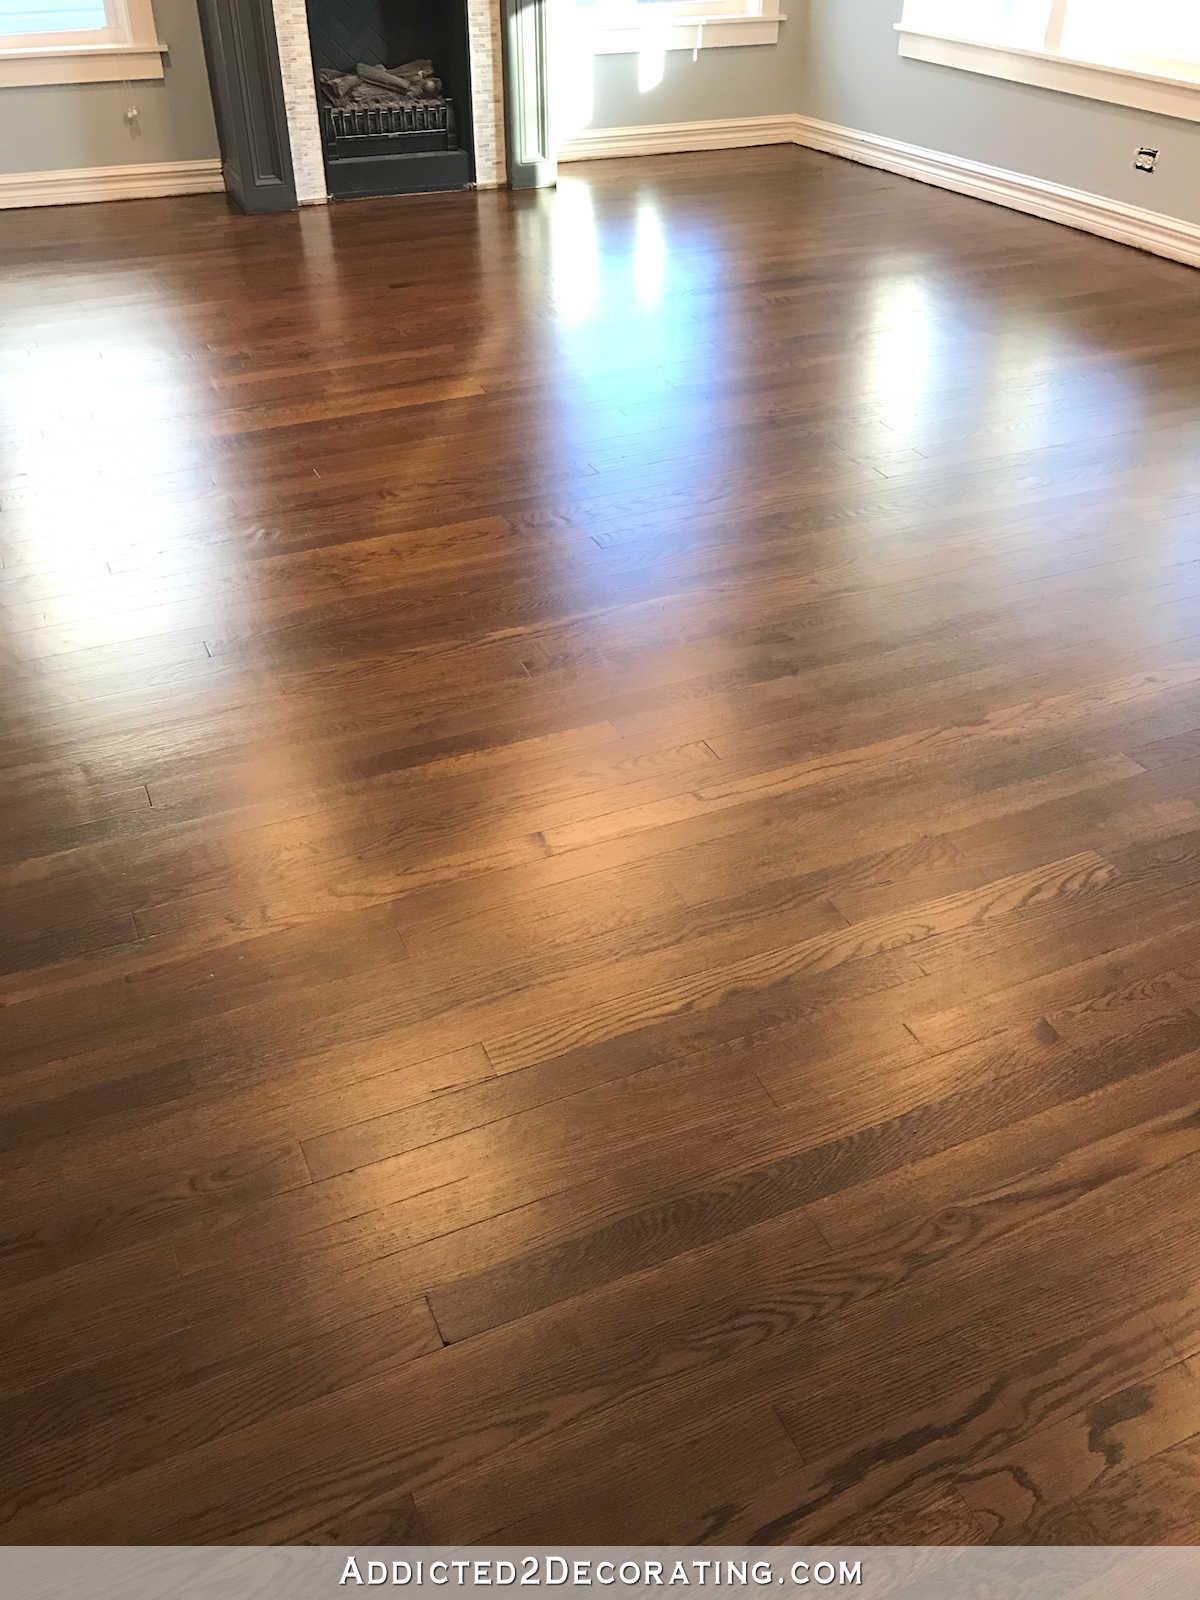 oak wood floor living room shabby chic pics my newly refinished red hardwood floors addicted 2 decorating